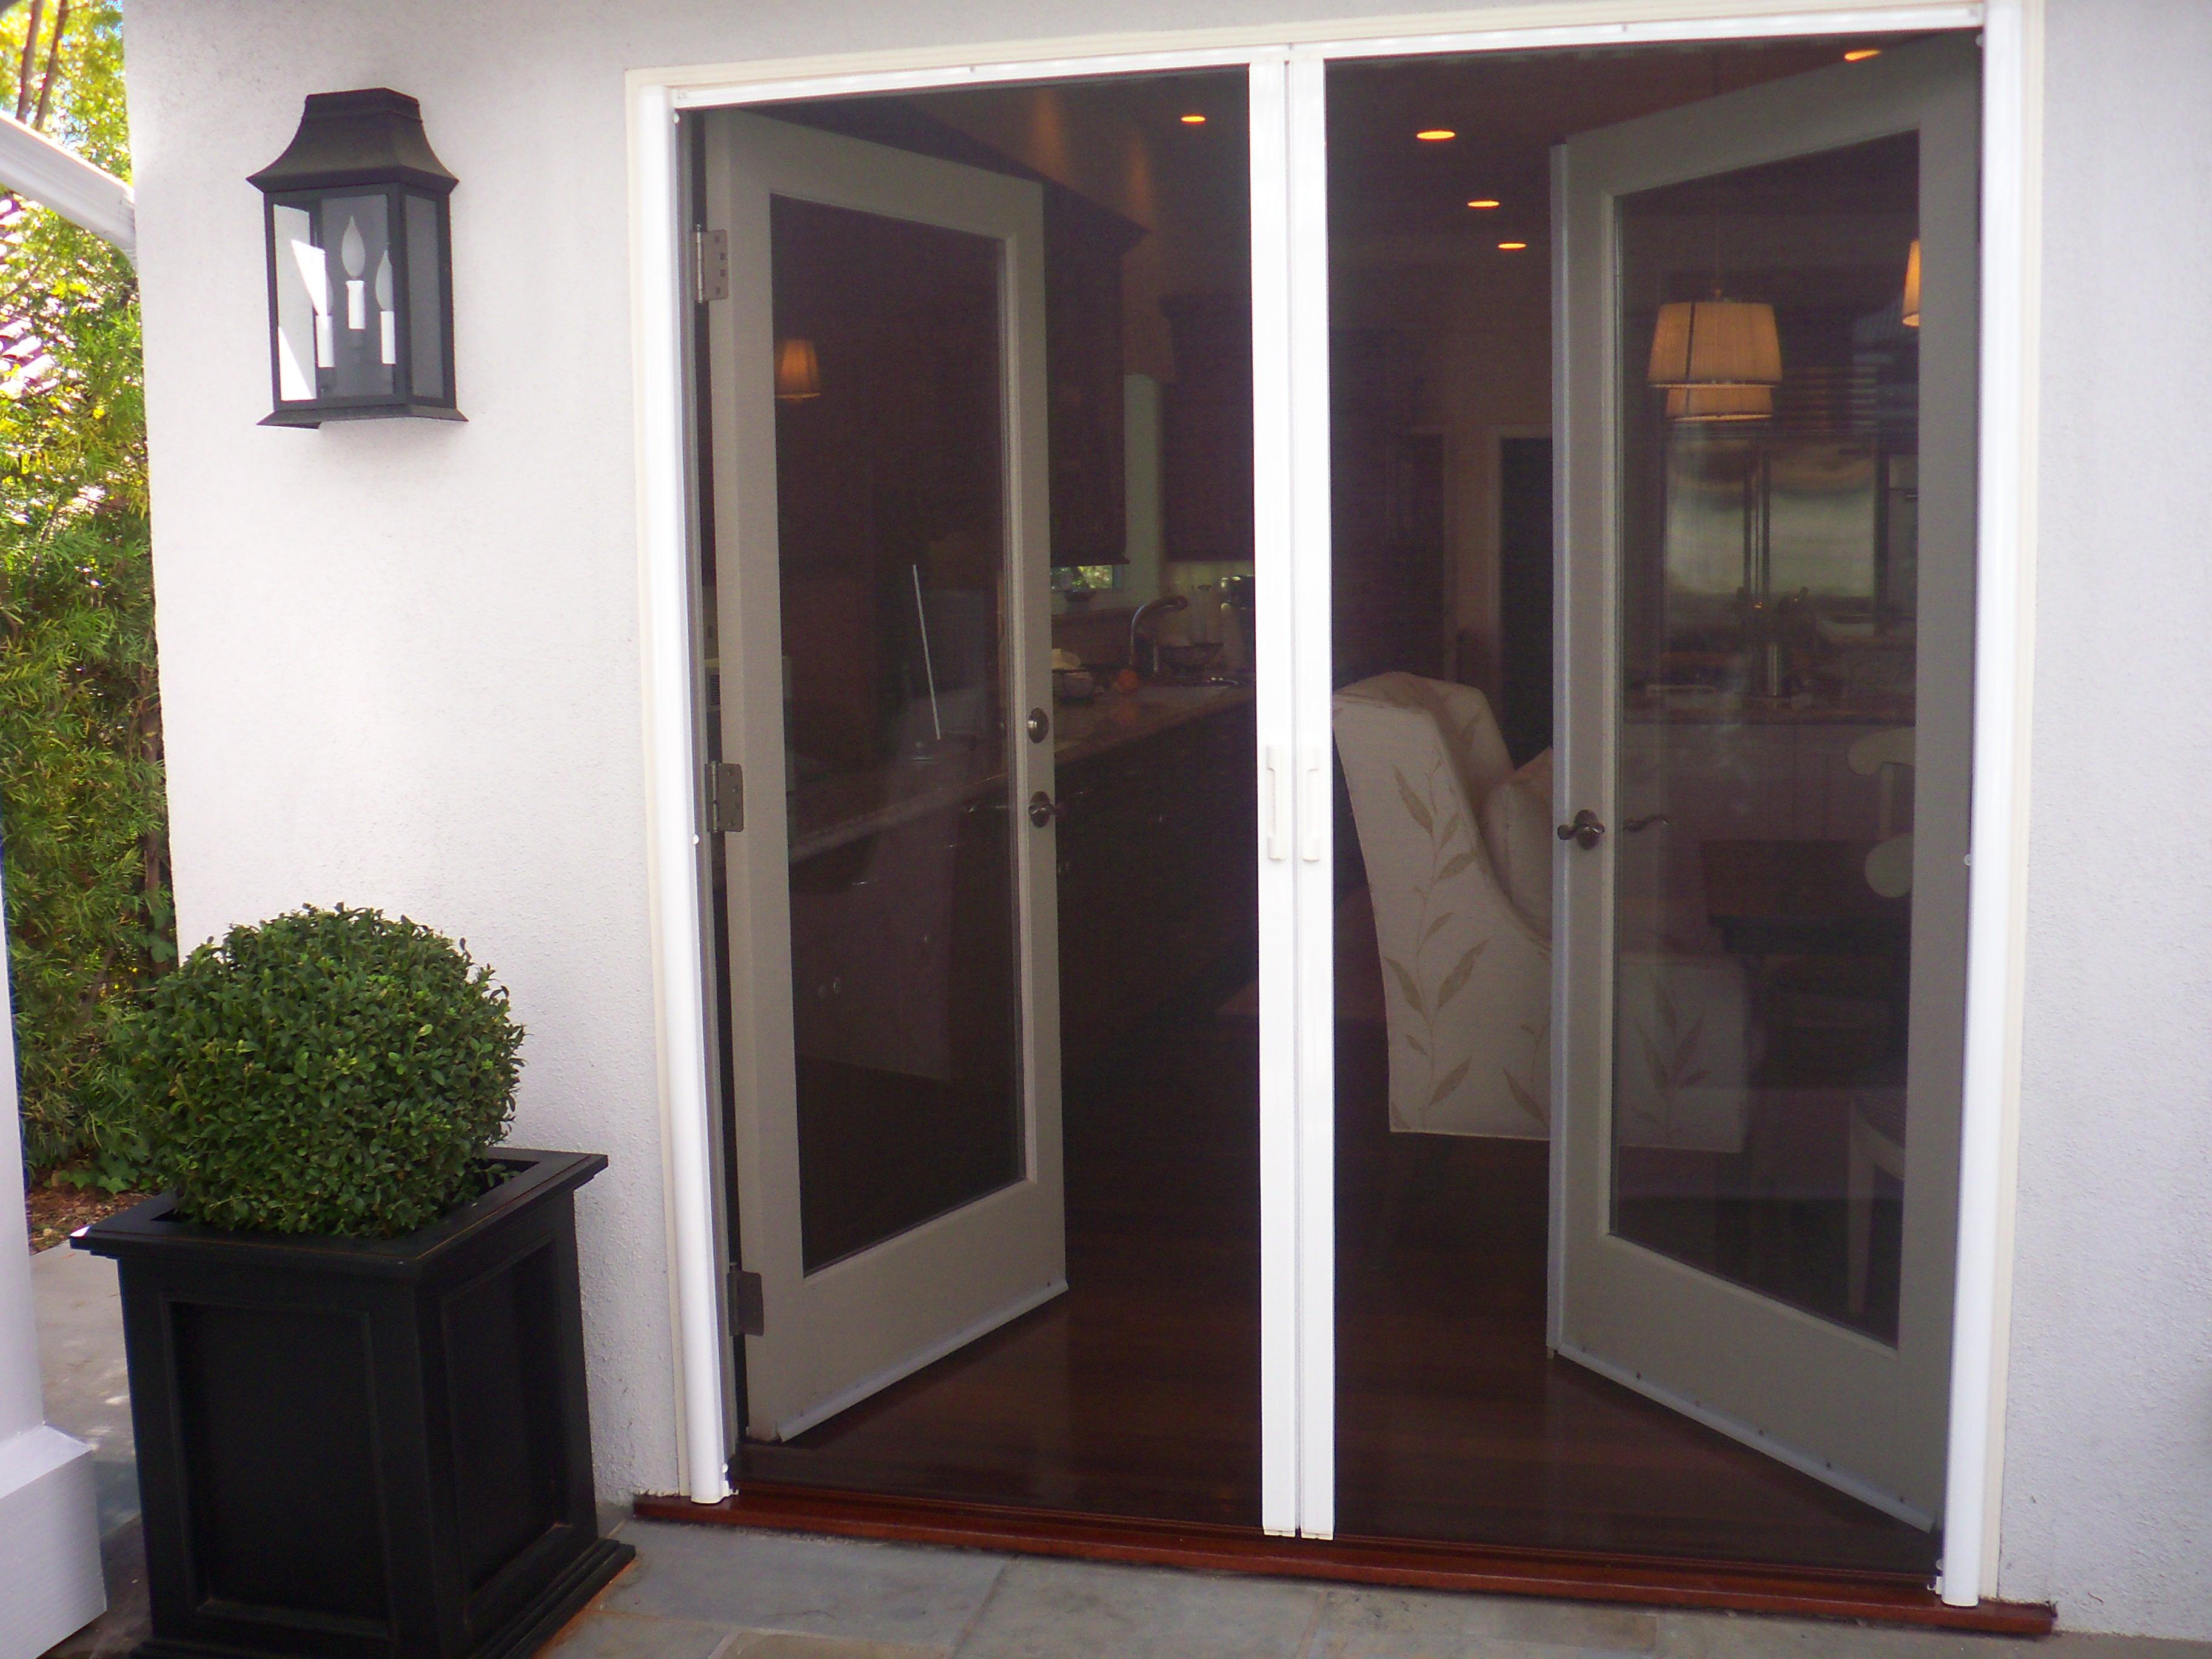 Retractable screens on french doors in sherman oaks for Folding screen door